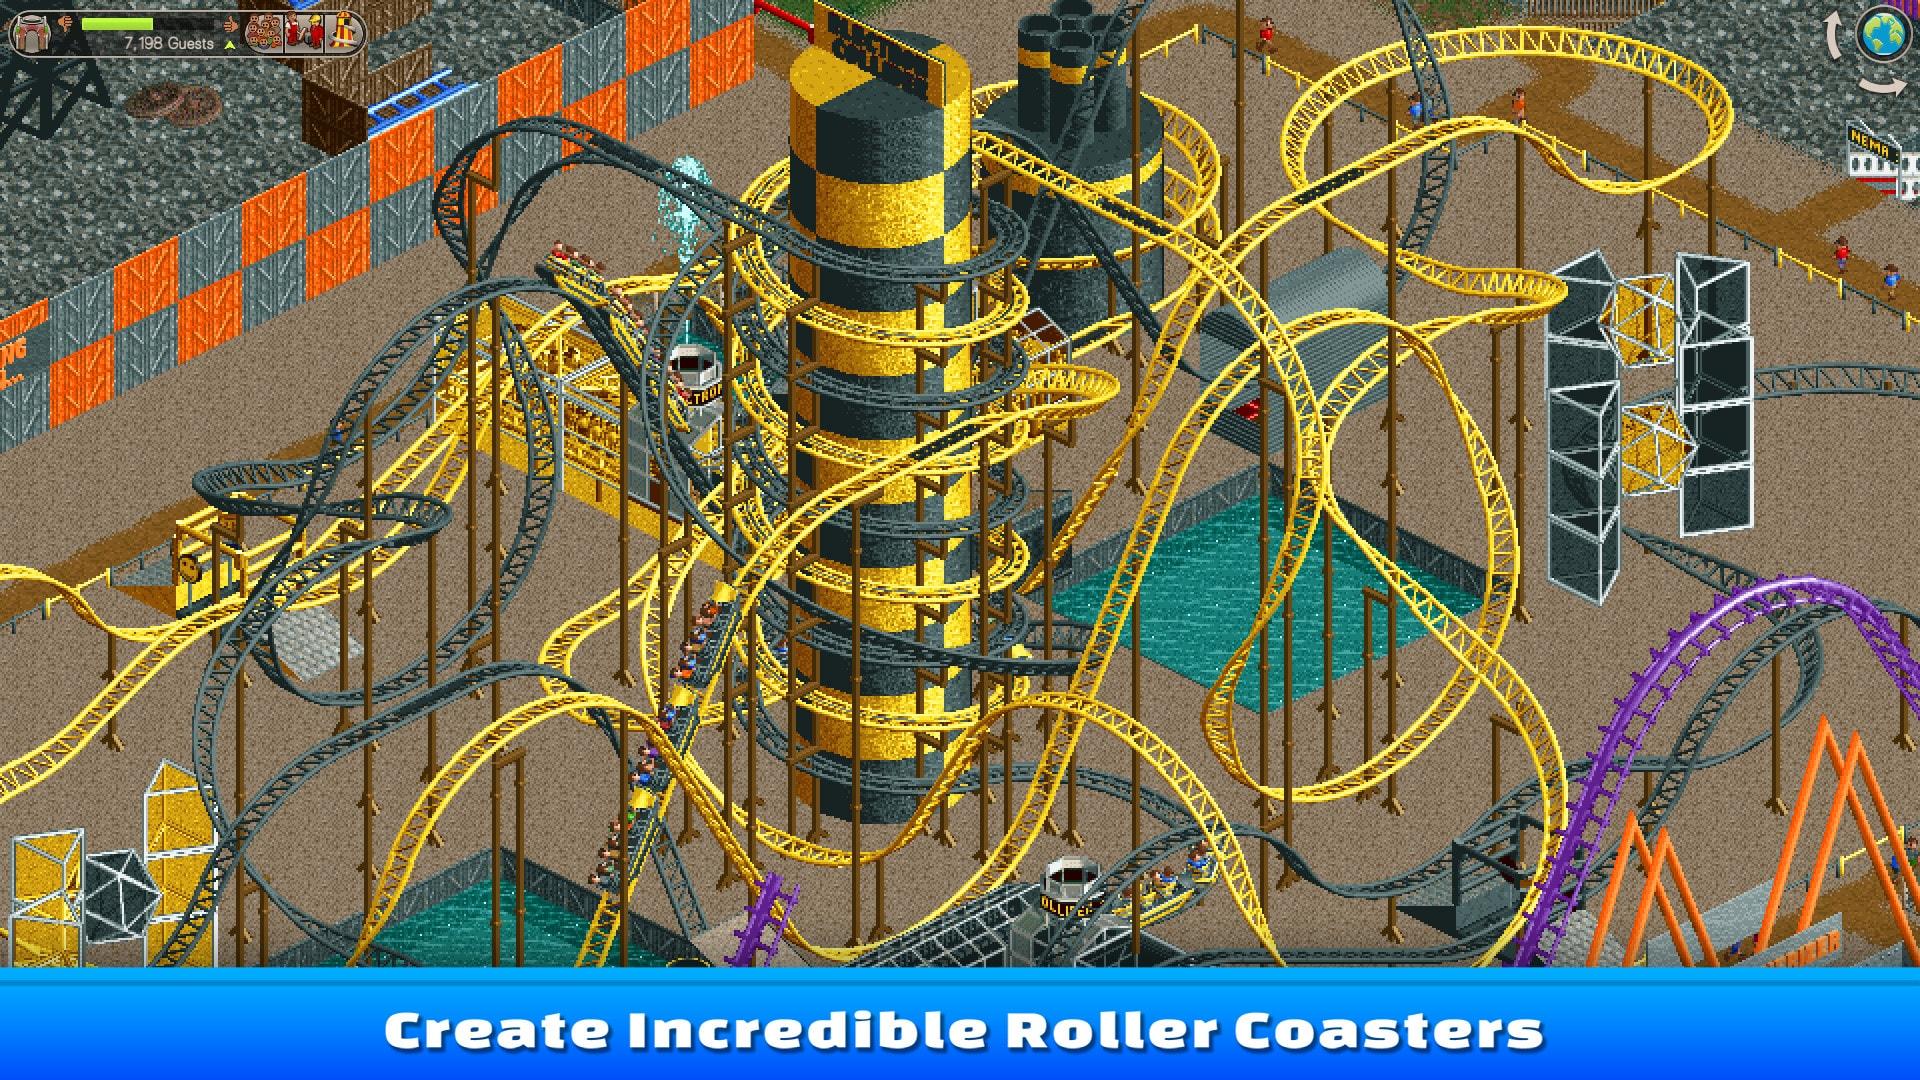 RollerCoaster Tycoon Classic Steam Key GLOBAL - 3